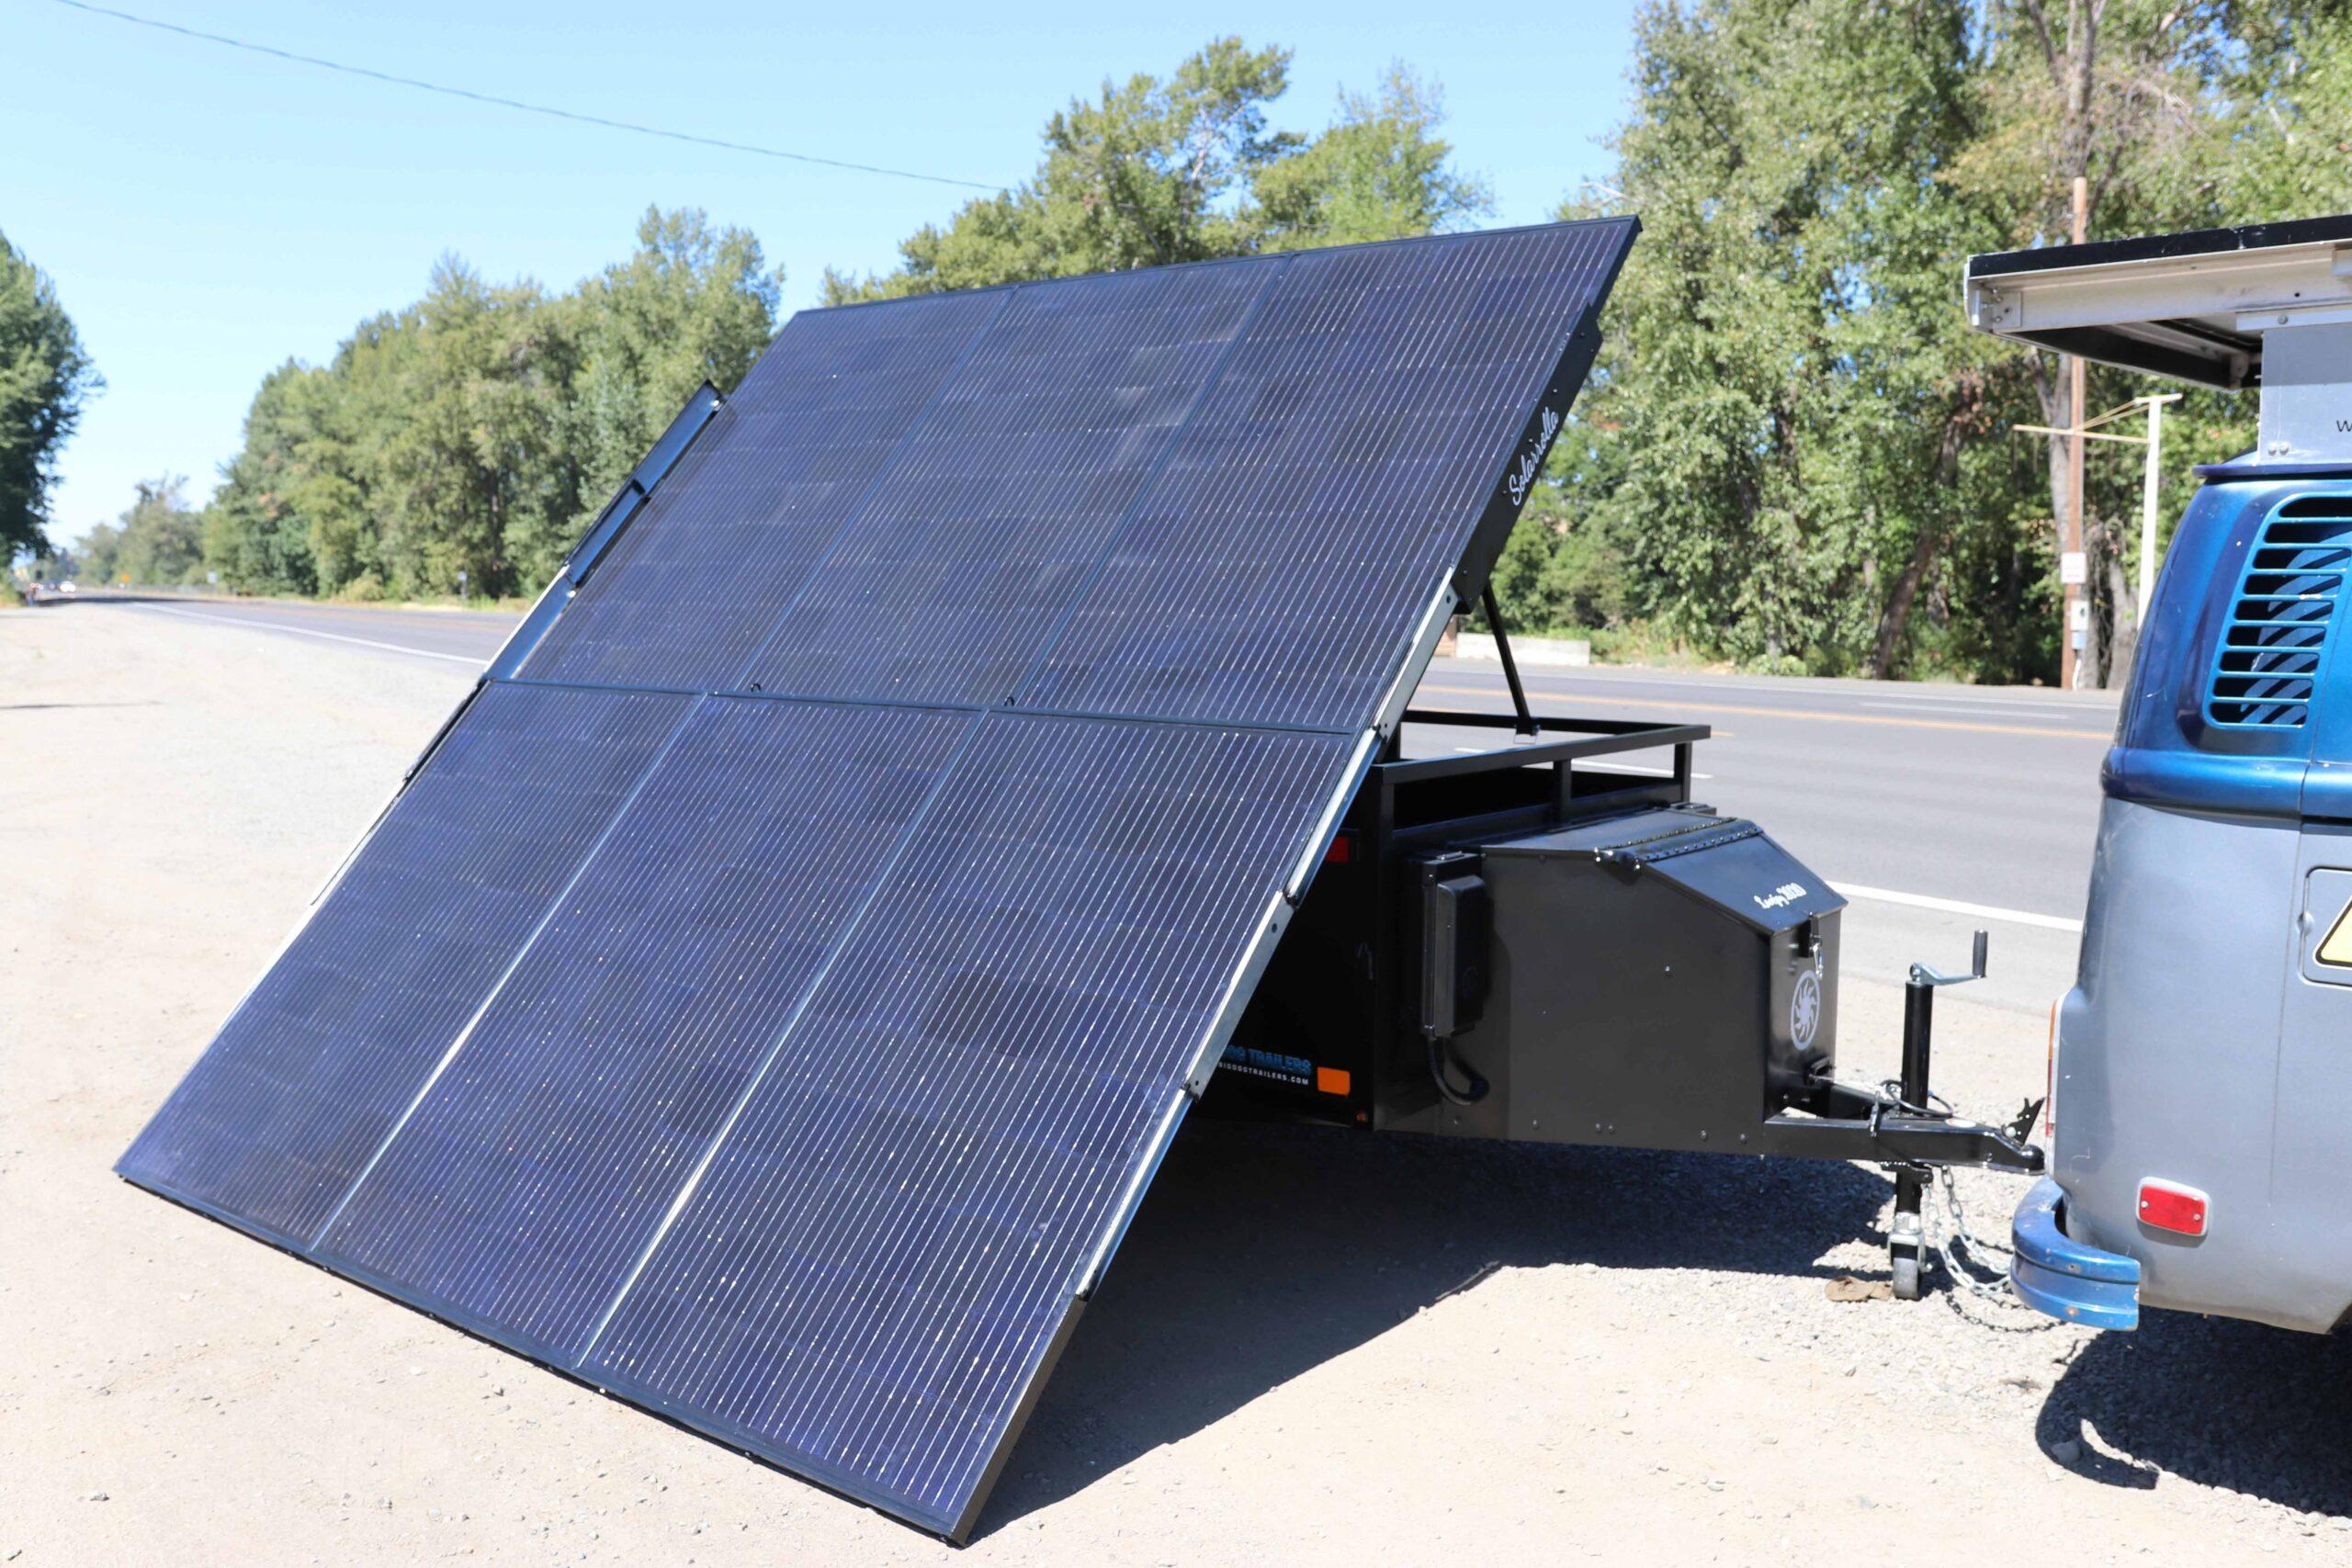 Solarrolla Solar Trailer, Mobile Charging Station